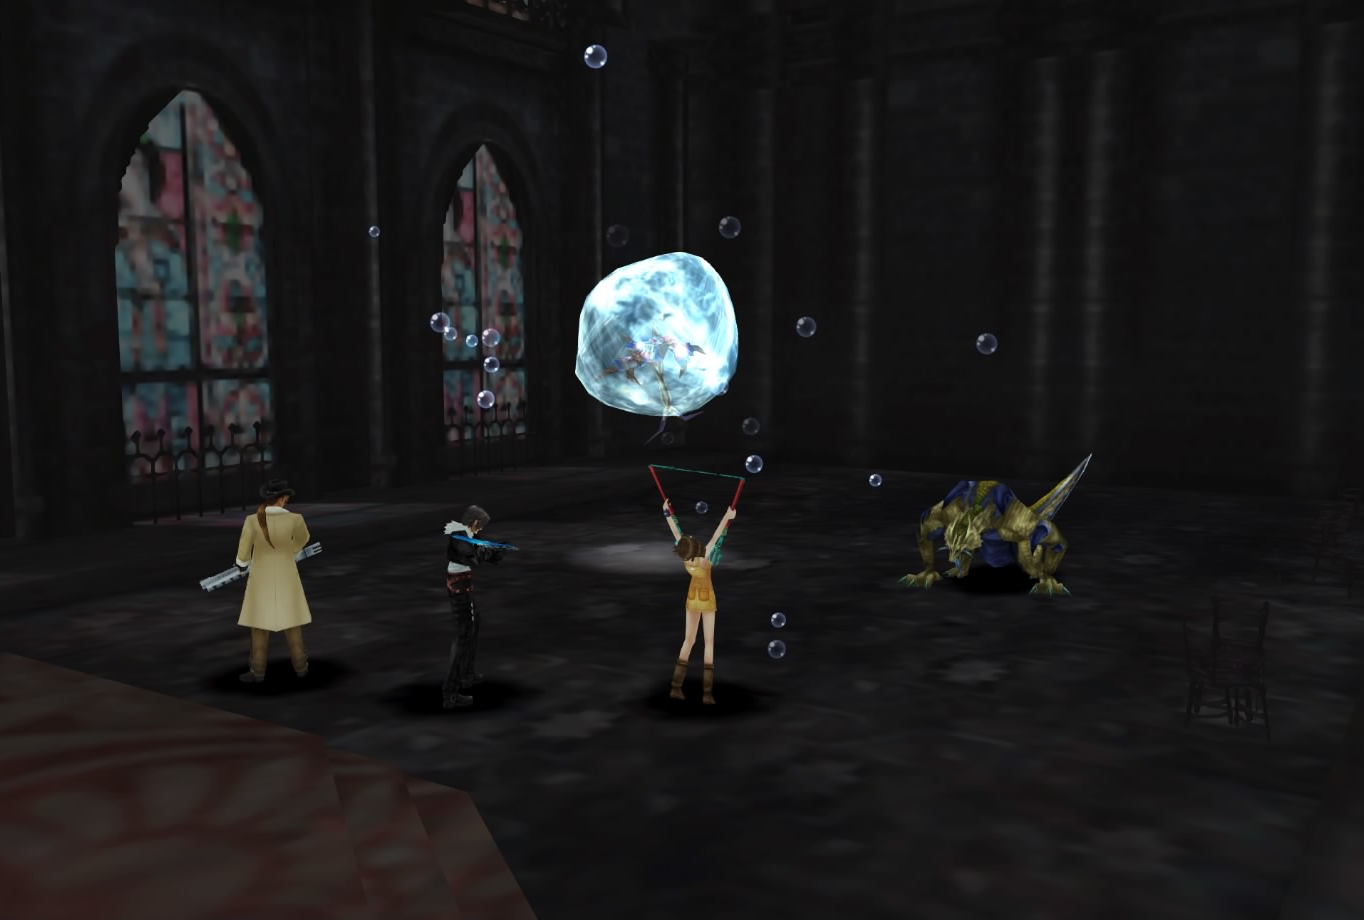 Water (Final Fantasy VIII)